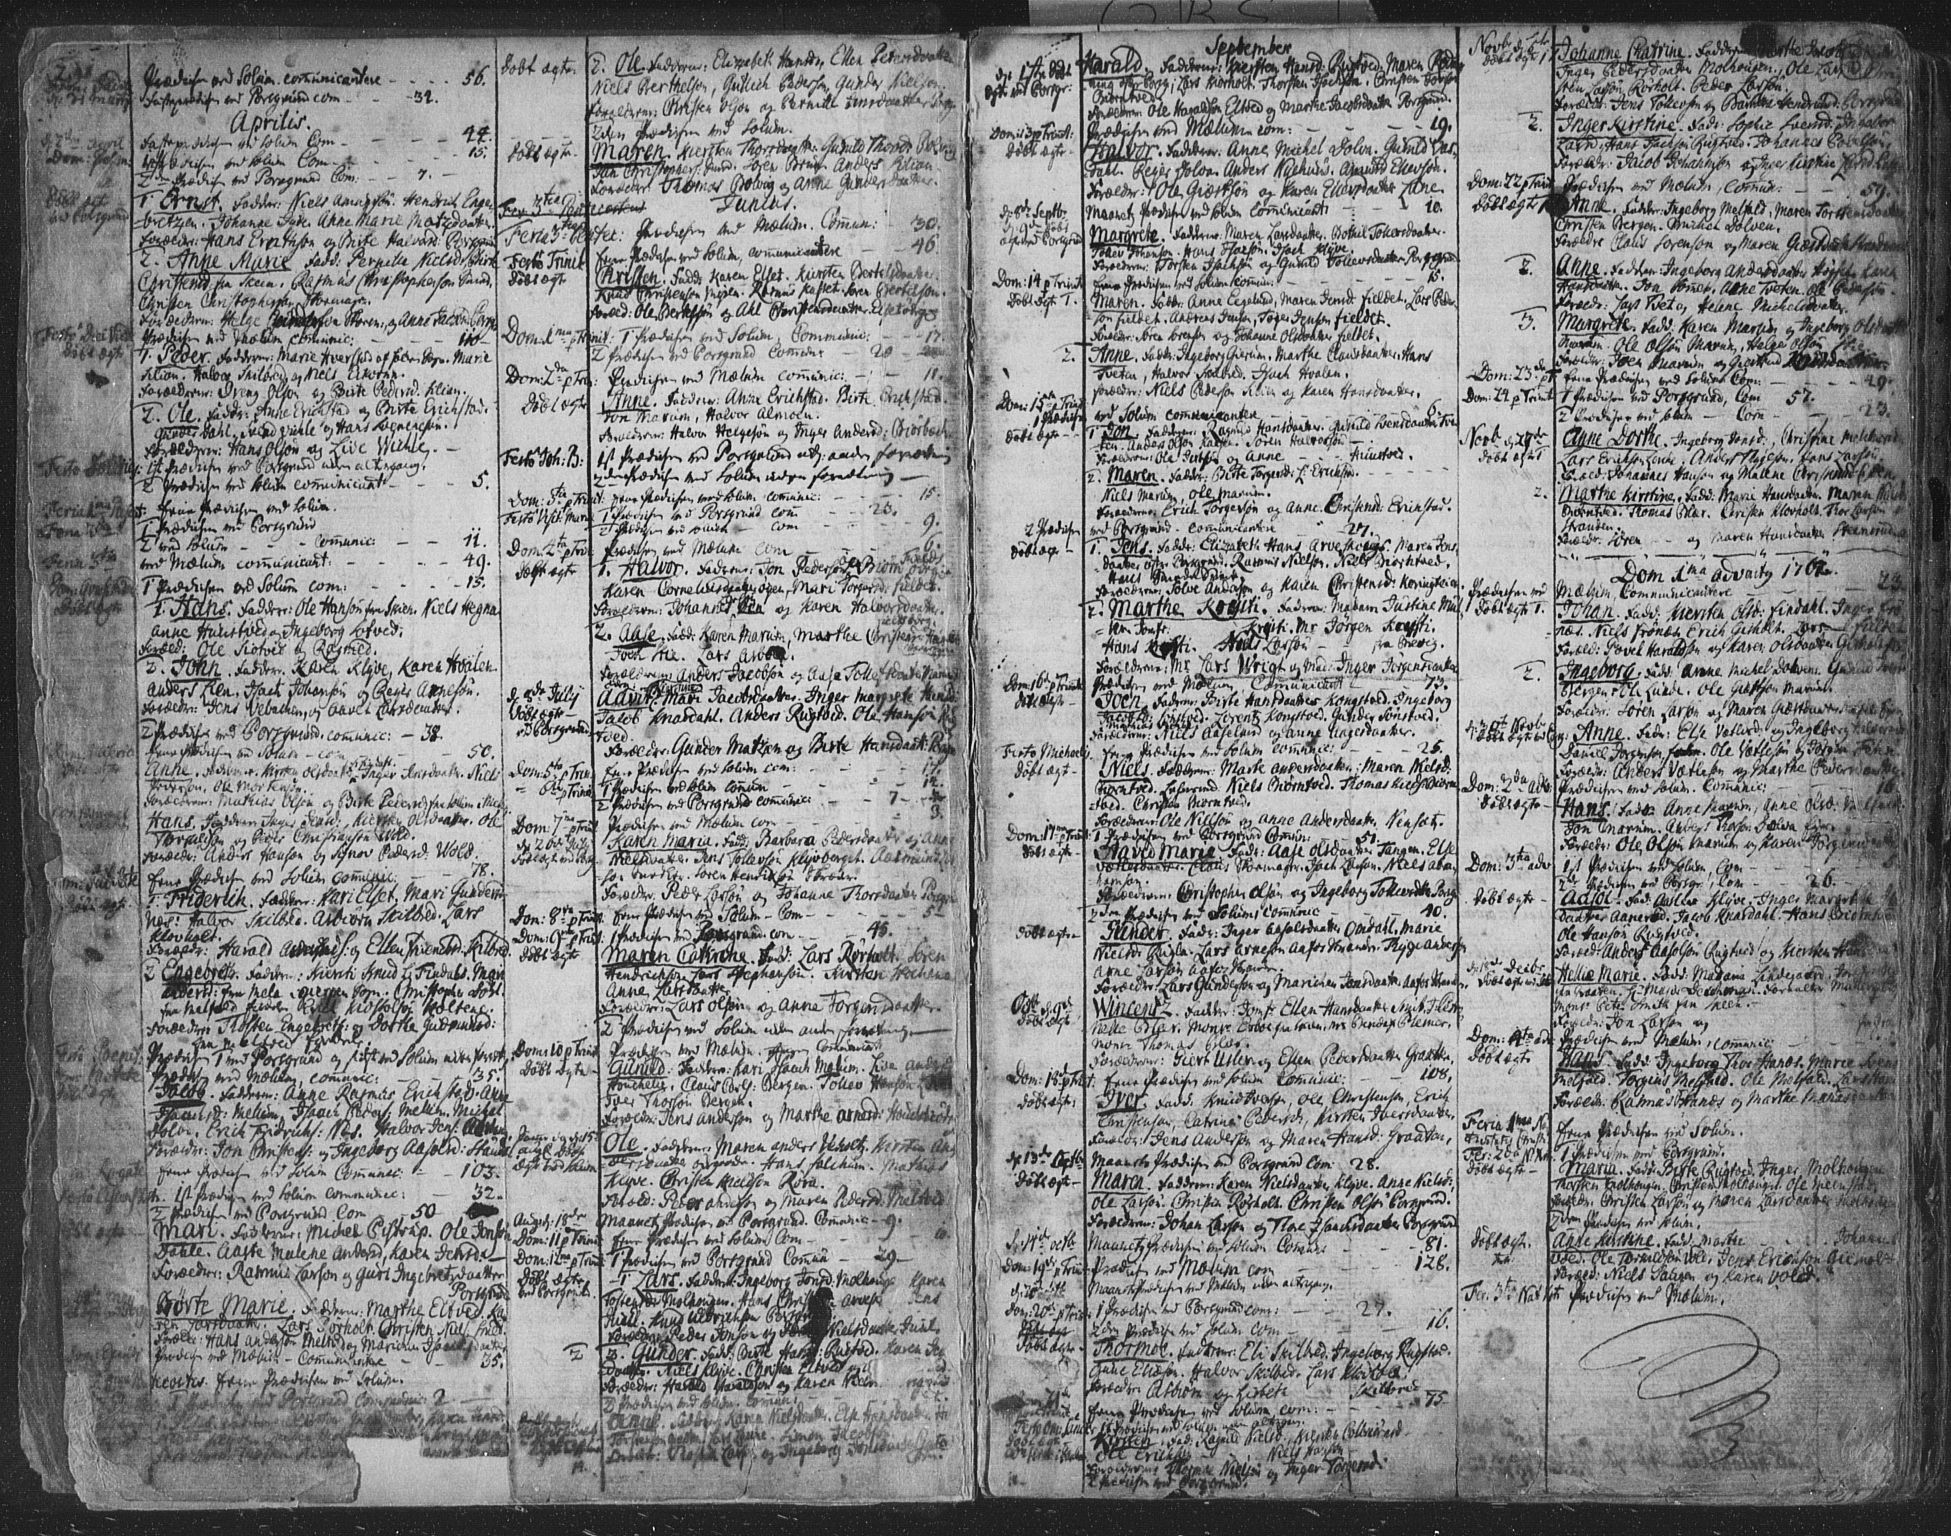 SAKO, Solum kirkebøker, F/Fa/L0003: Ministerialbok nr. I 3, 1761-1814, s. 2-3